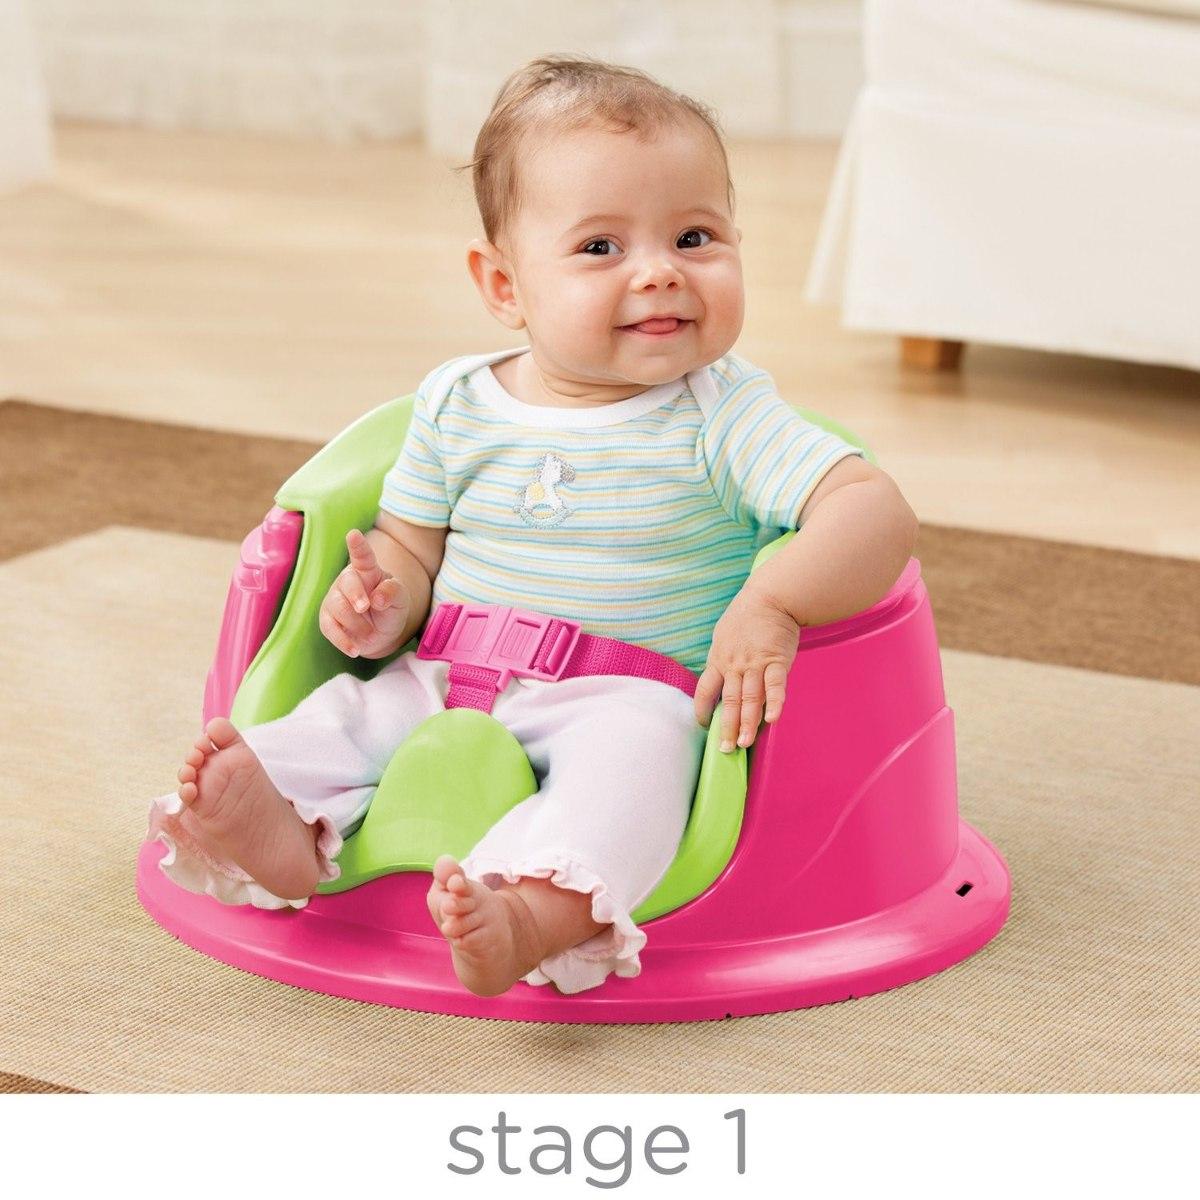 Silla booster gimnasio summer infant para bebe 3 etapa - Silla para comer bebe ...